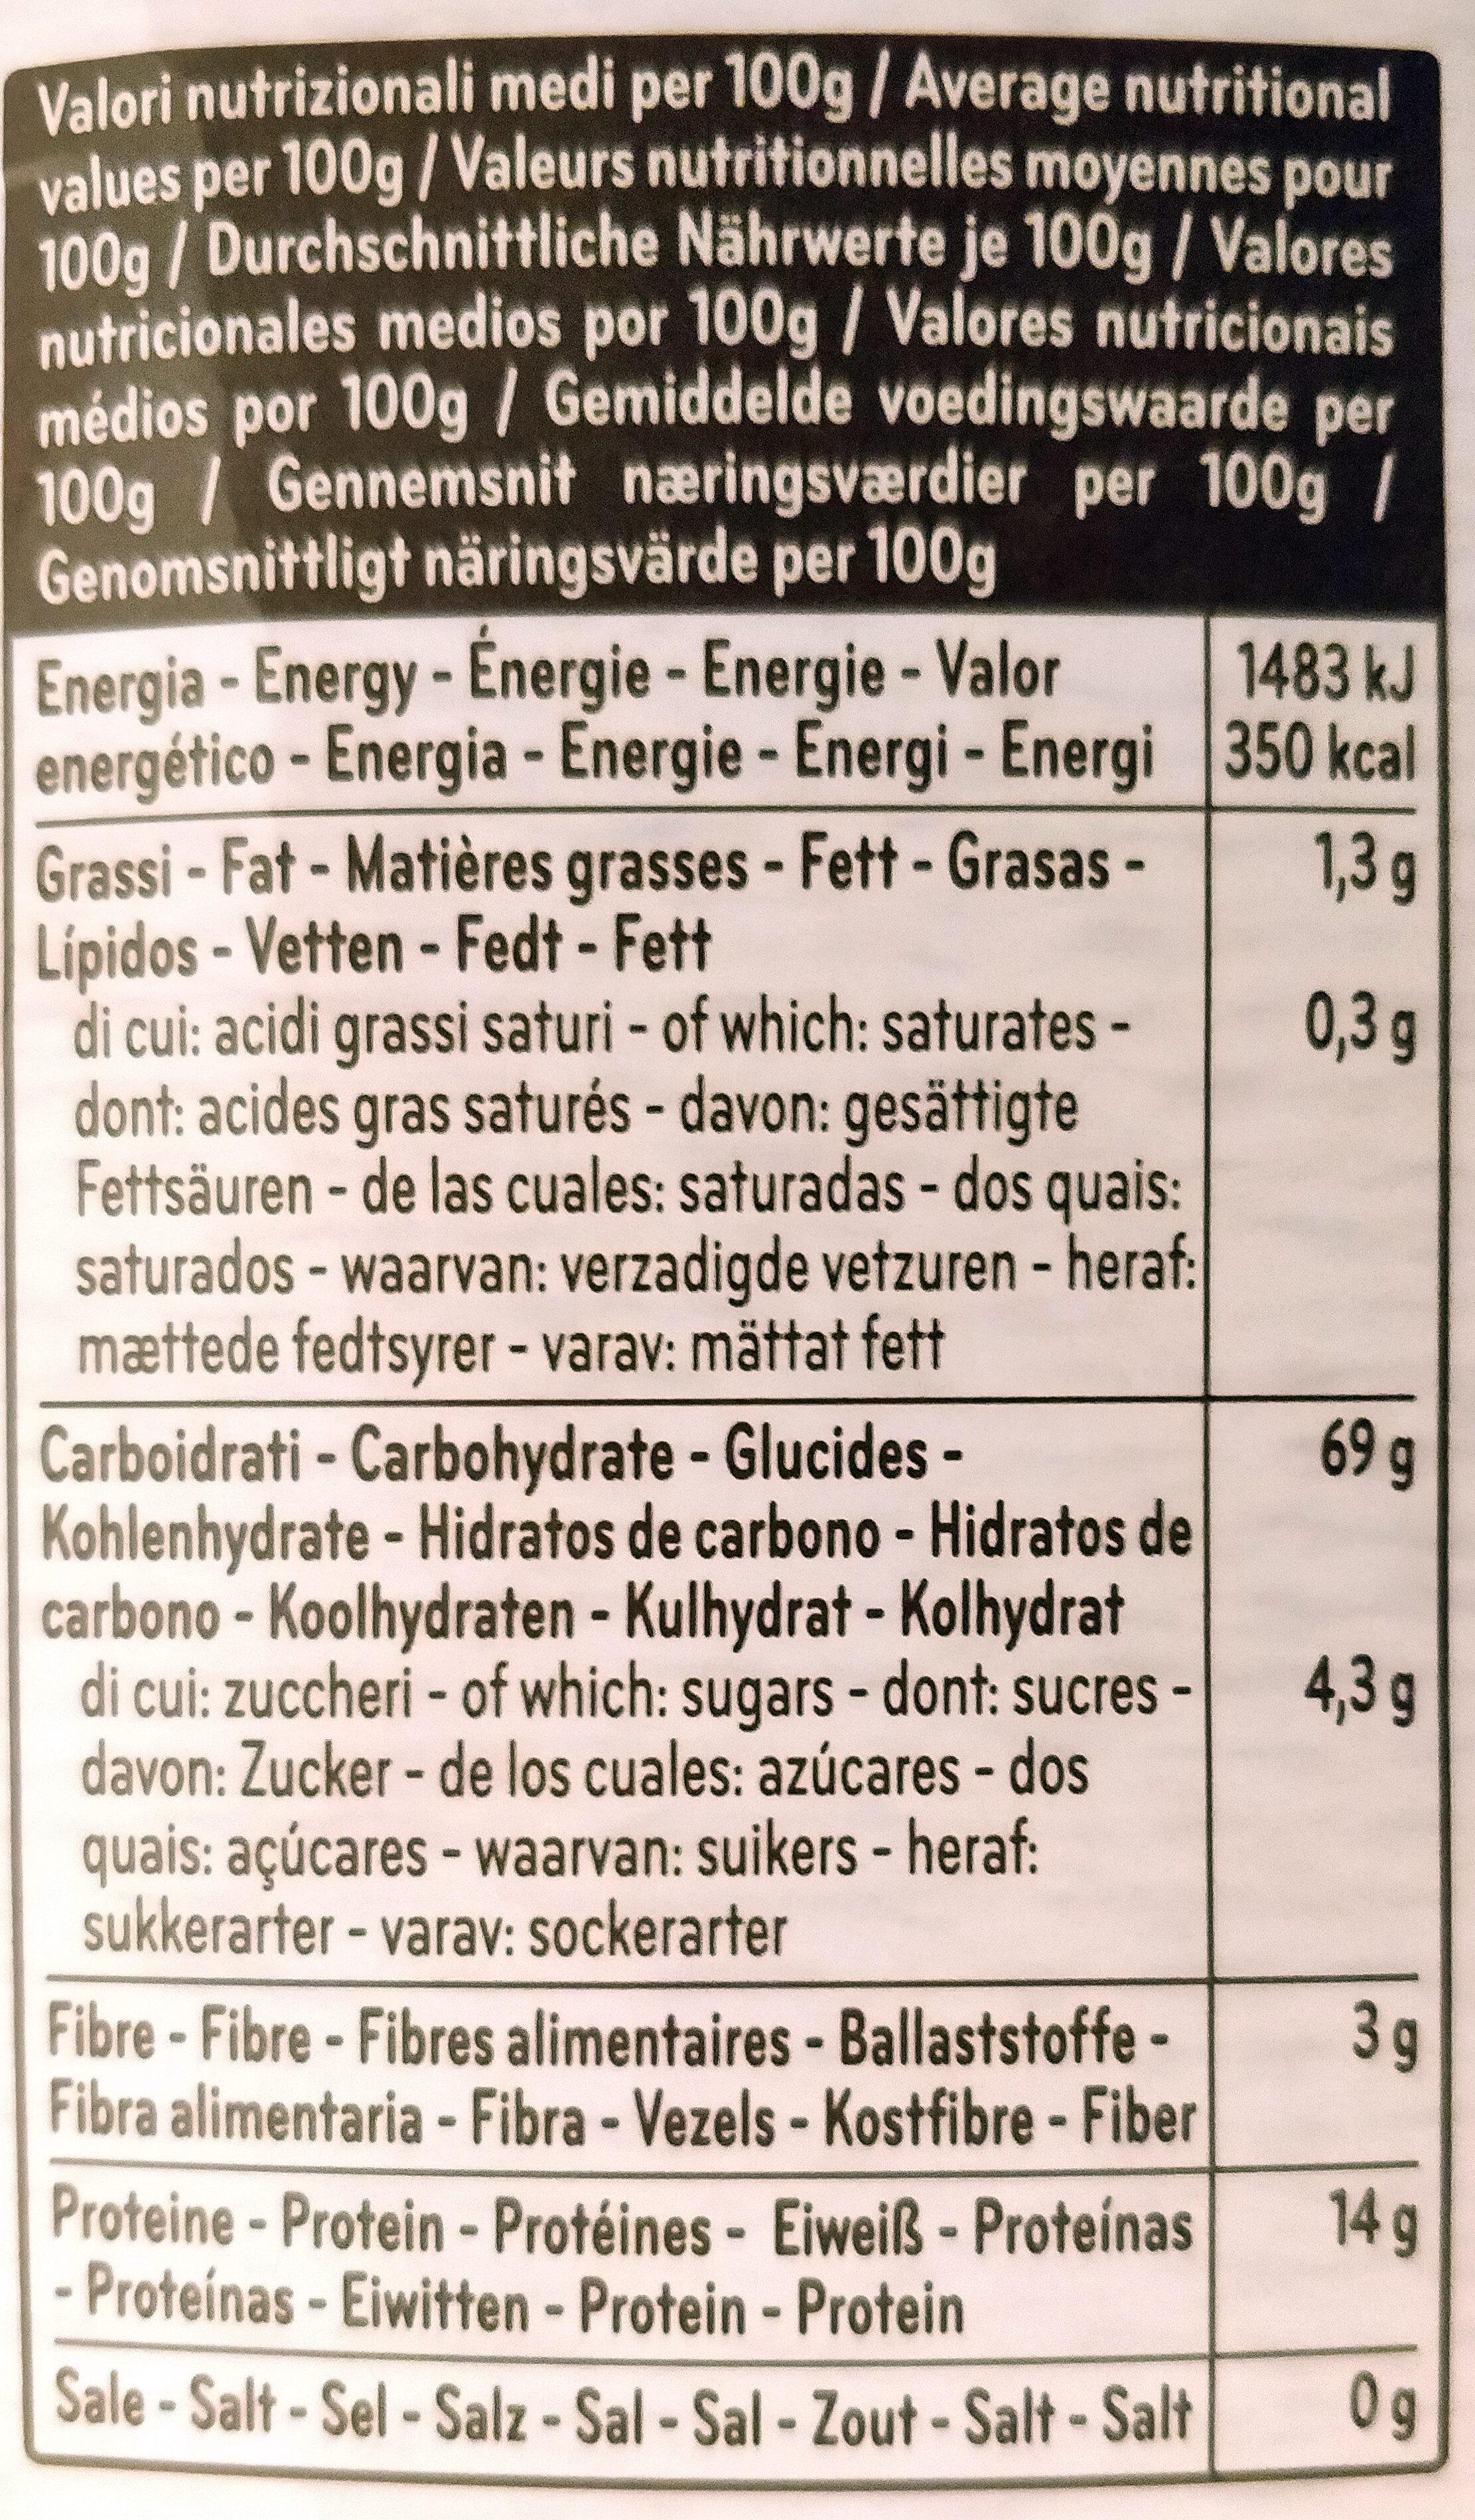 Penne Rigate n°41 Kamut - Informations nutritionnelles